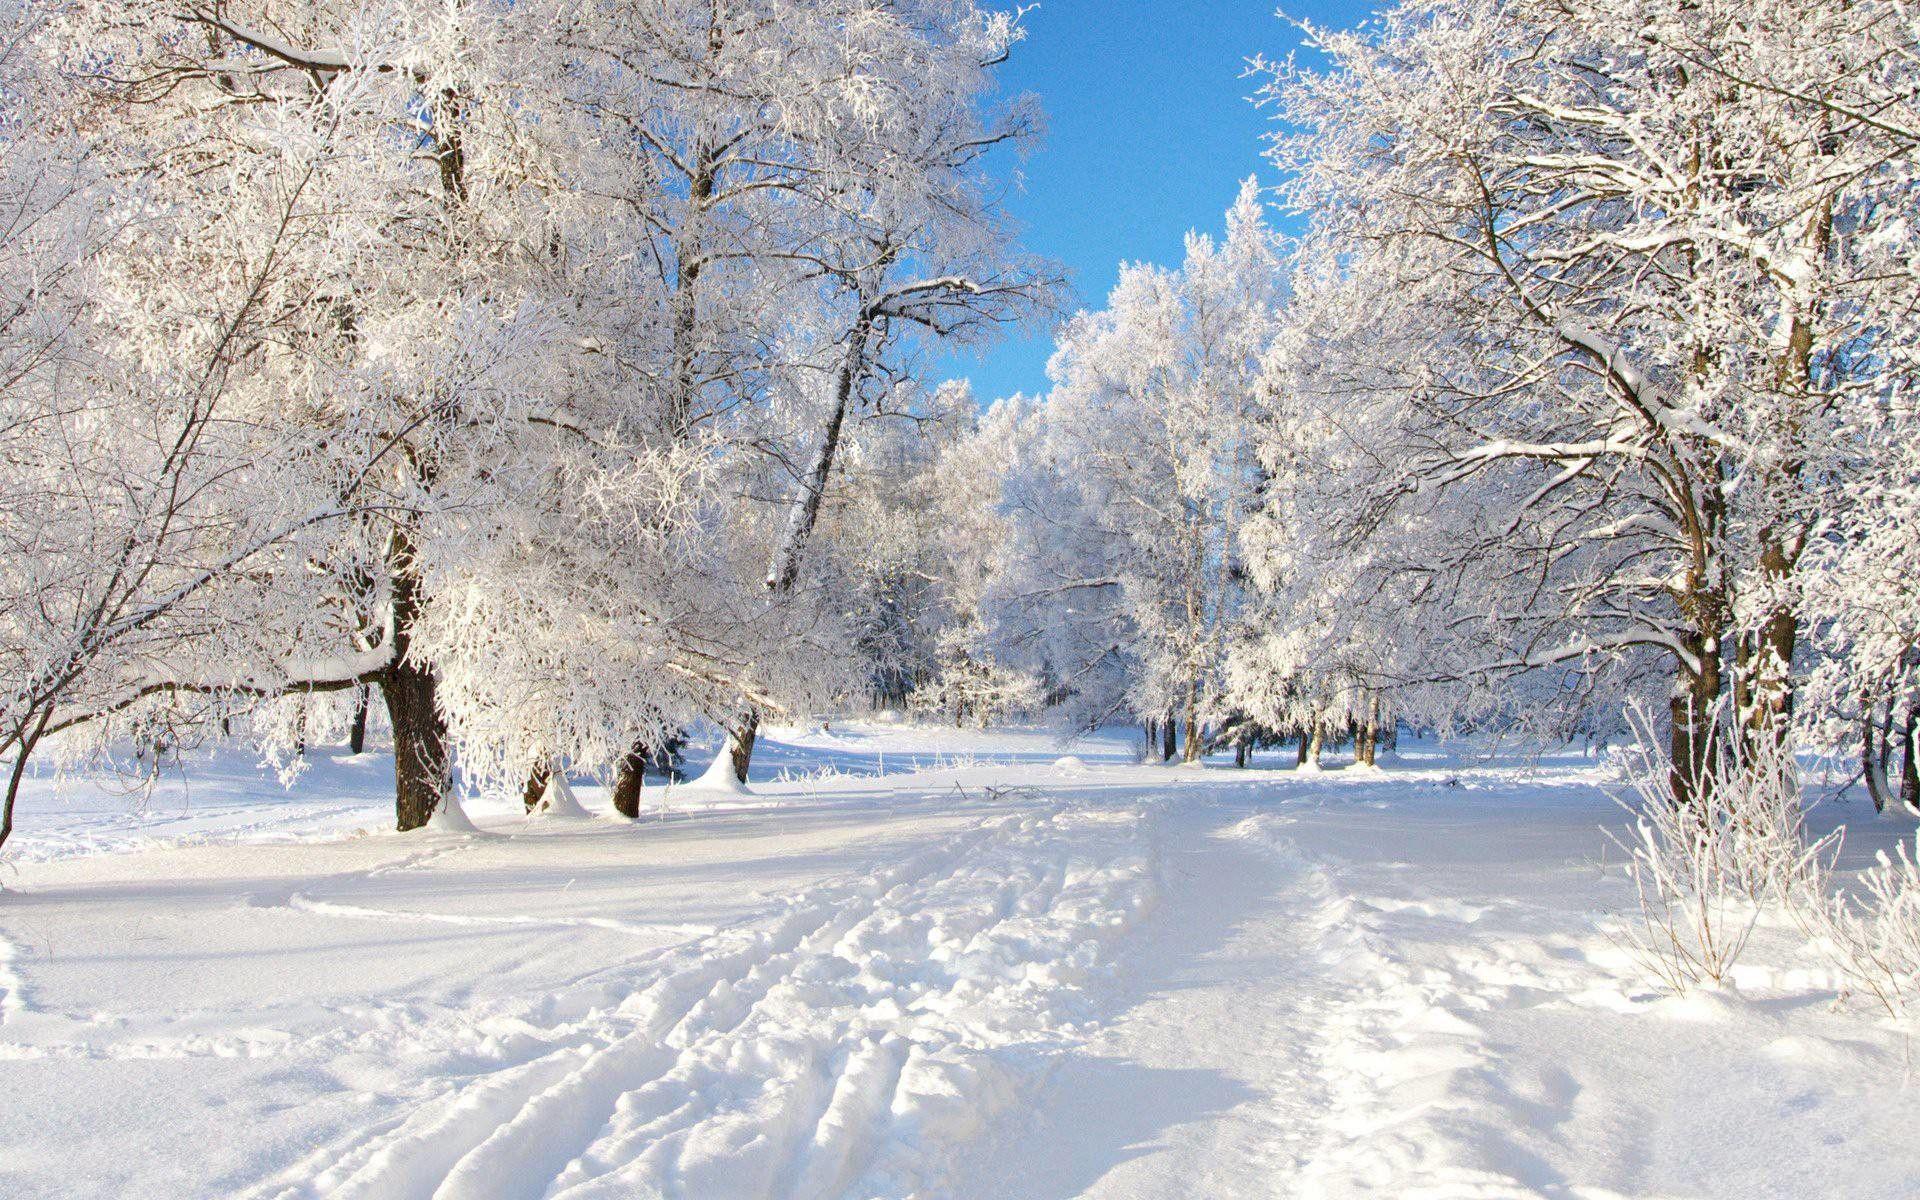 1920x1200 Free Winter Desktop Wallpaper Download Winter Wallpapers Winter Desktop Background Winter Scenery Free Winter Wallpaper